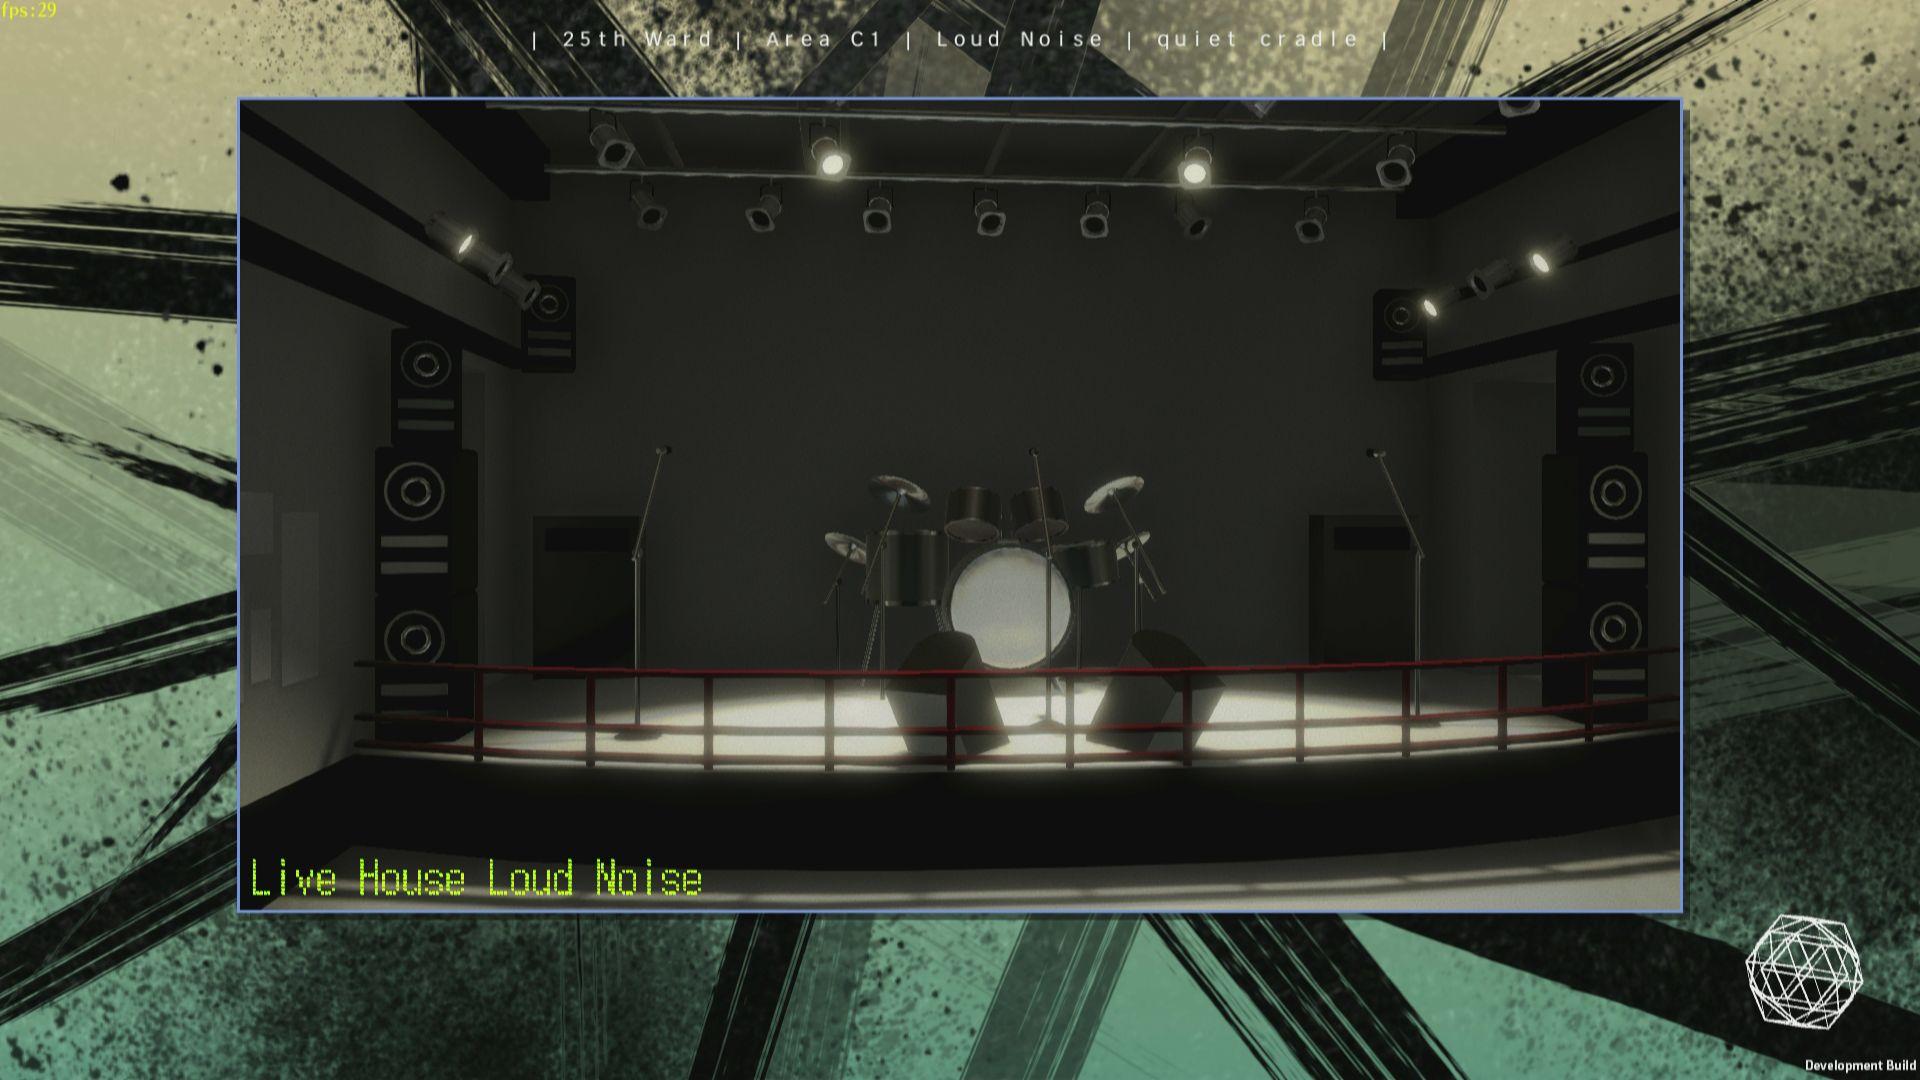 The 25th Ward The Silver Case Screen 21